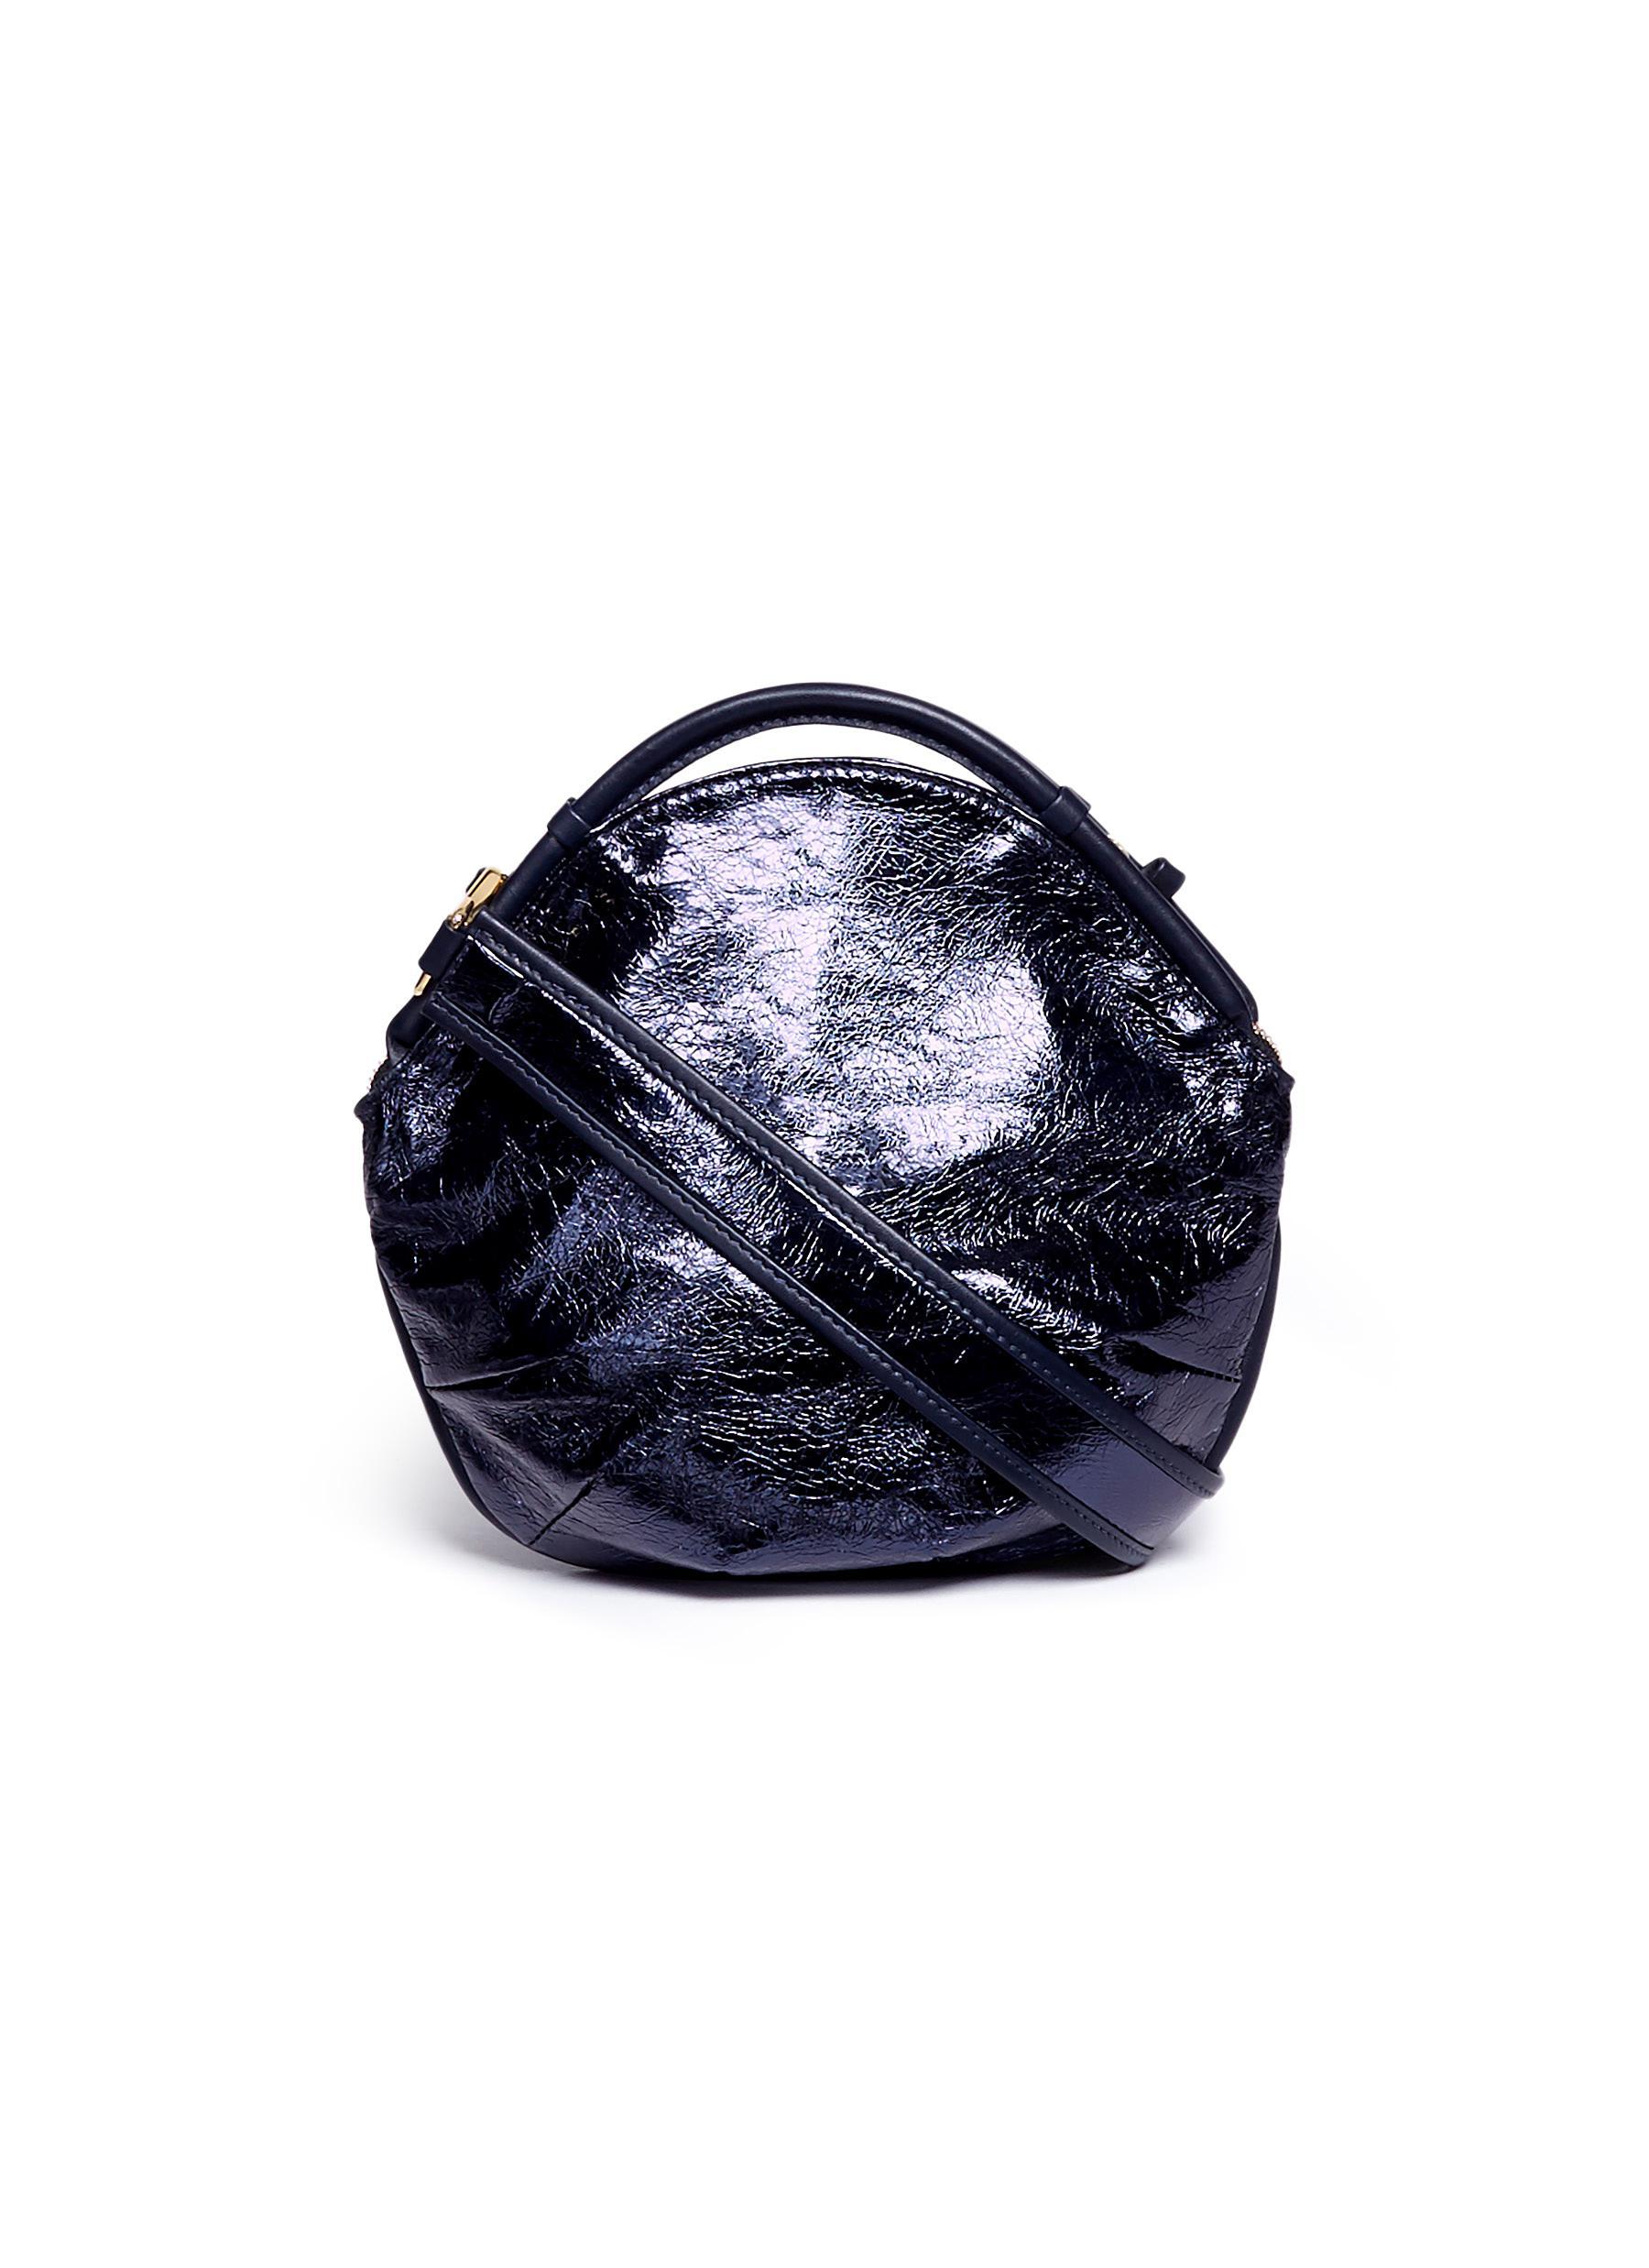 Petal Miniature colourblock metallic leather bag by A-Esque